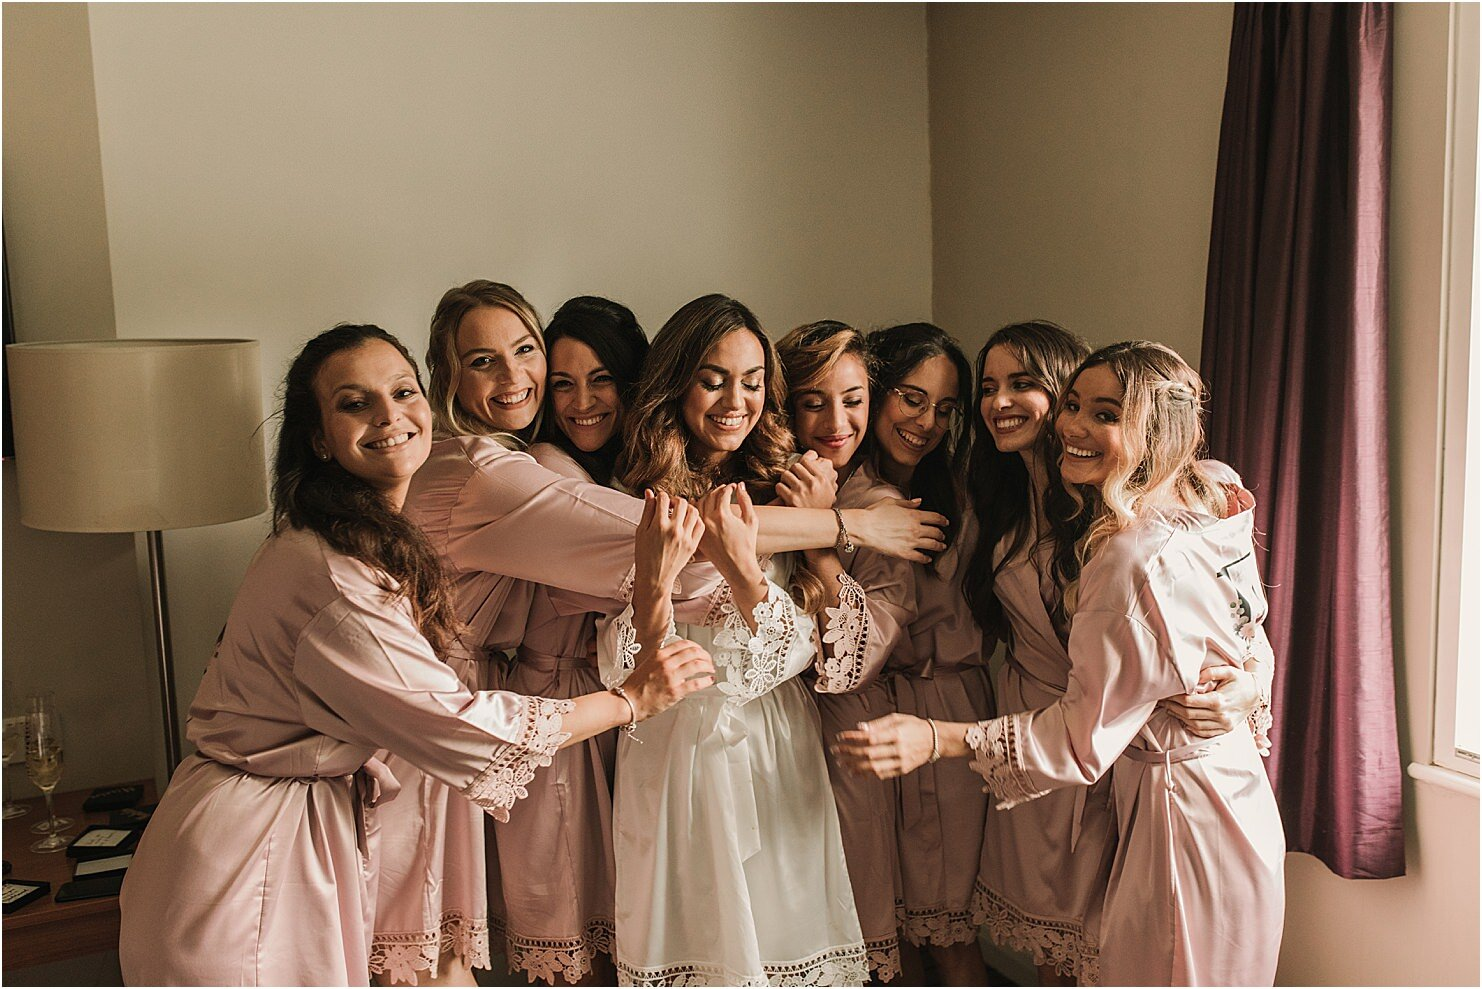 boda-de-cuento-en-castillo-boda-en-londres-29.jpg